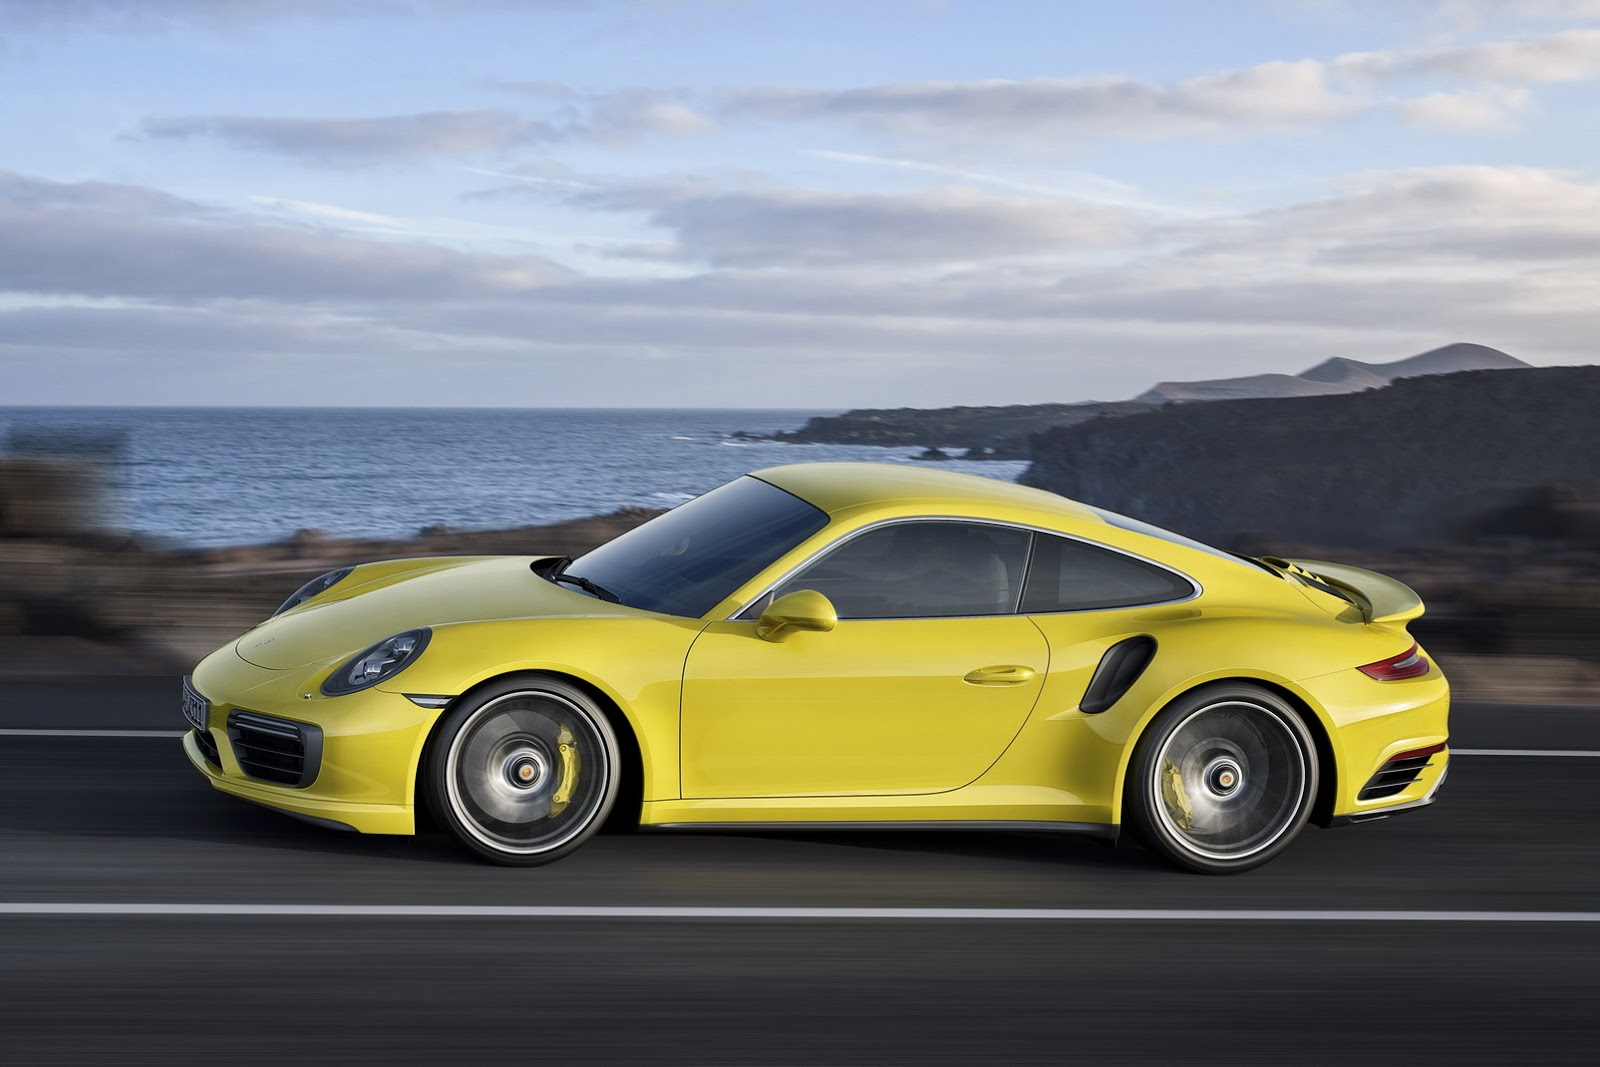 photo gallery - Porsche 911 Turbo S